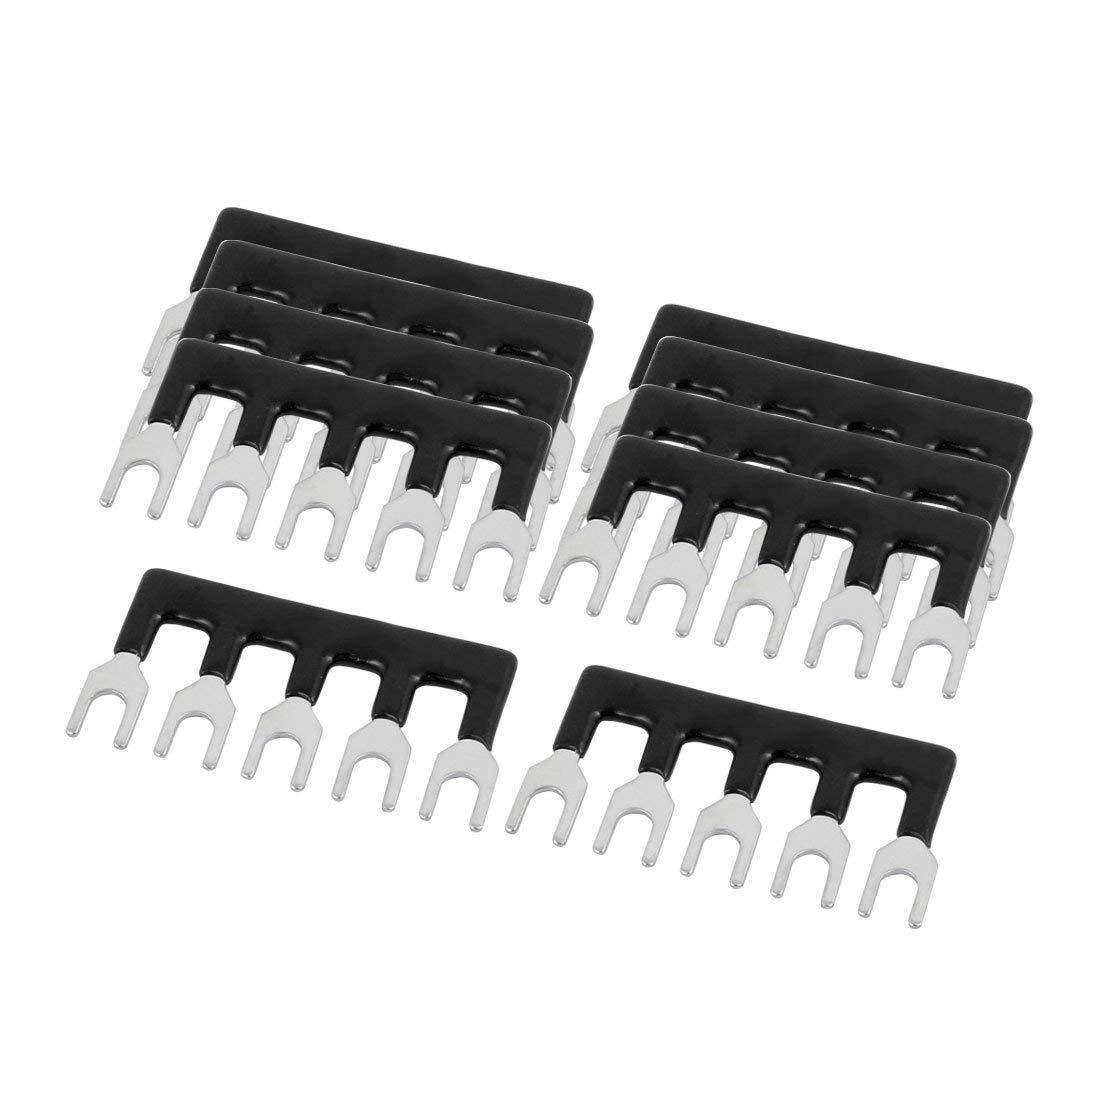 uxcell 10PCS 600V 15A 5mm Pitch 5 Position PCB Terminal Block Strip Barrier Black